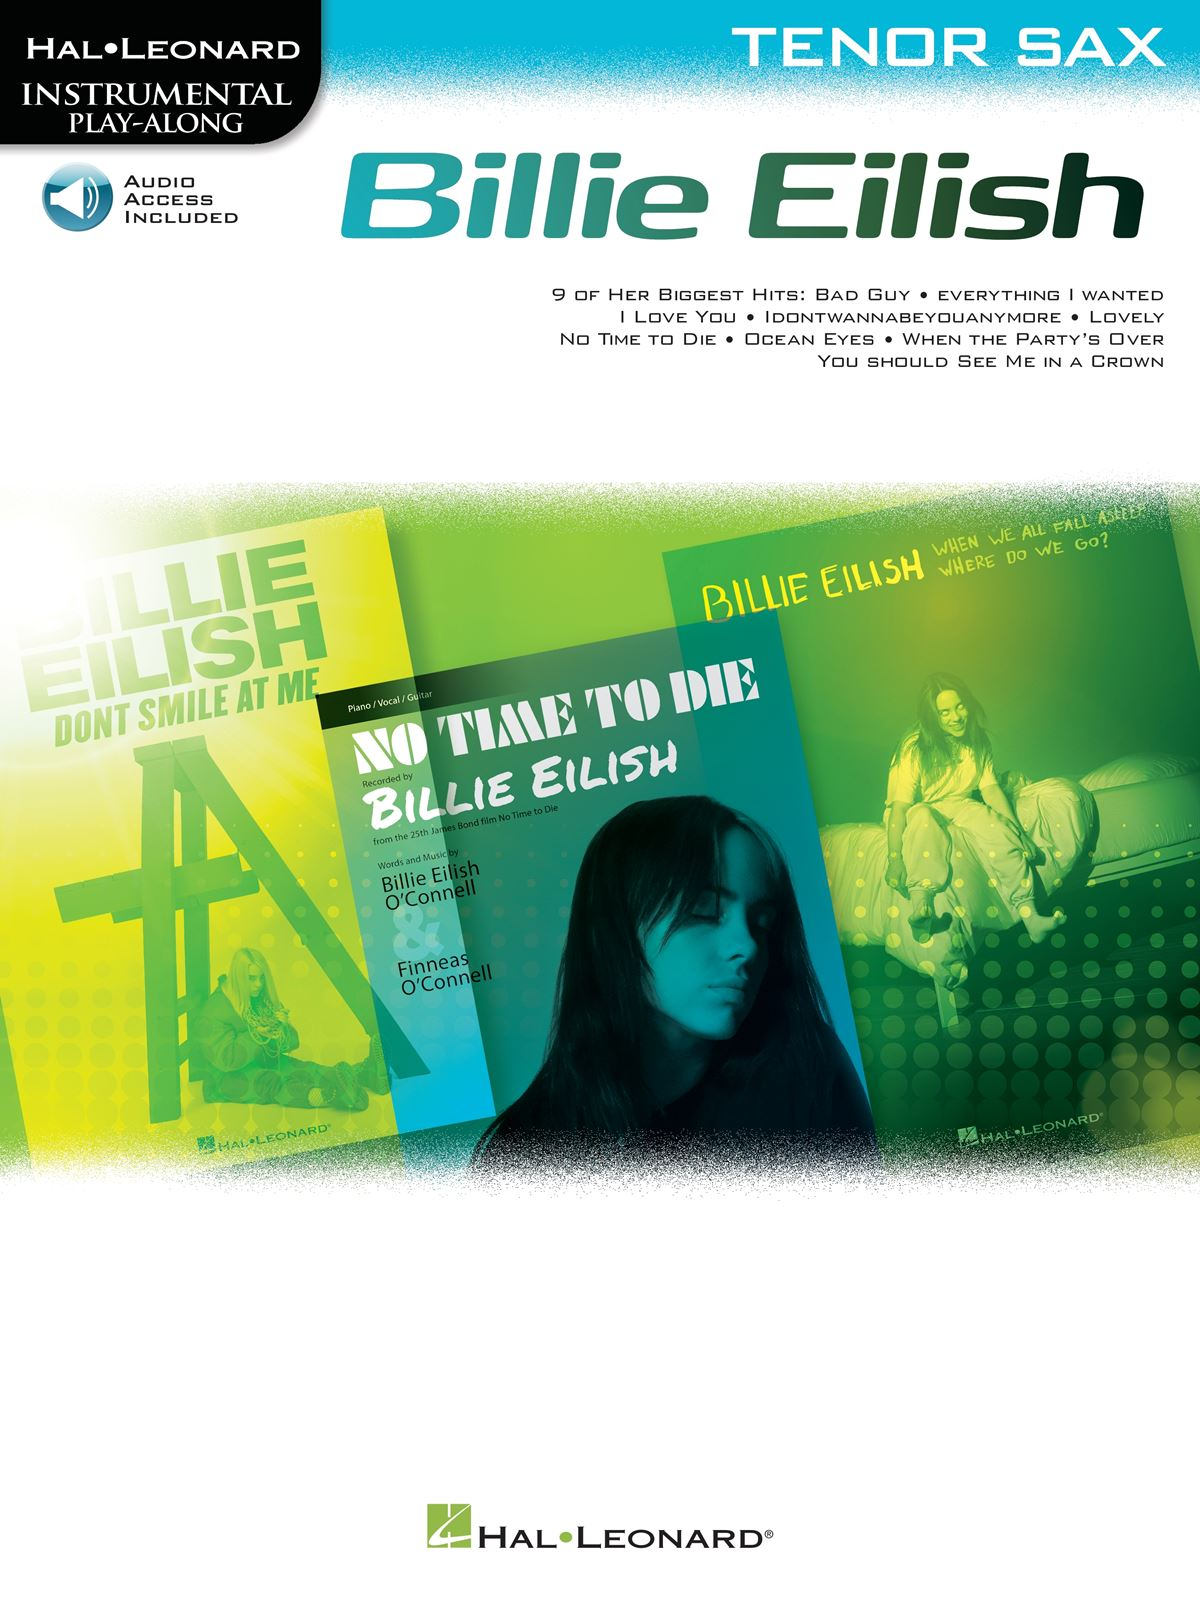 Billie Eilish: Billie Eilish For Tenor Sax: Tenor Saxophone: Instrumental